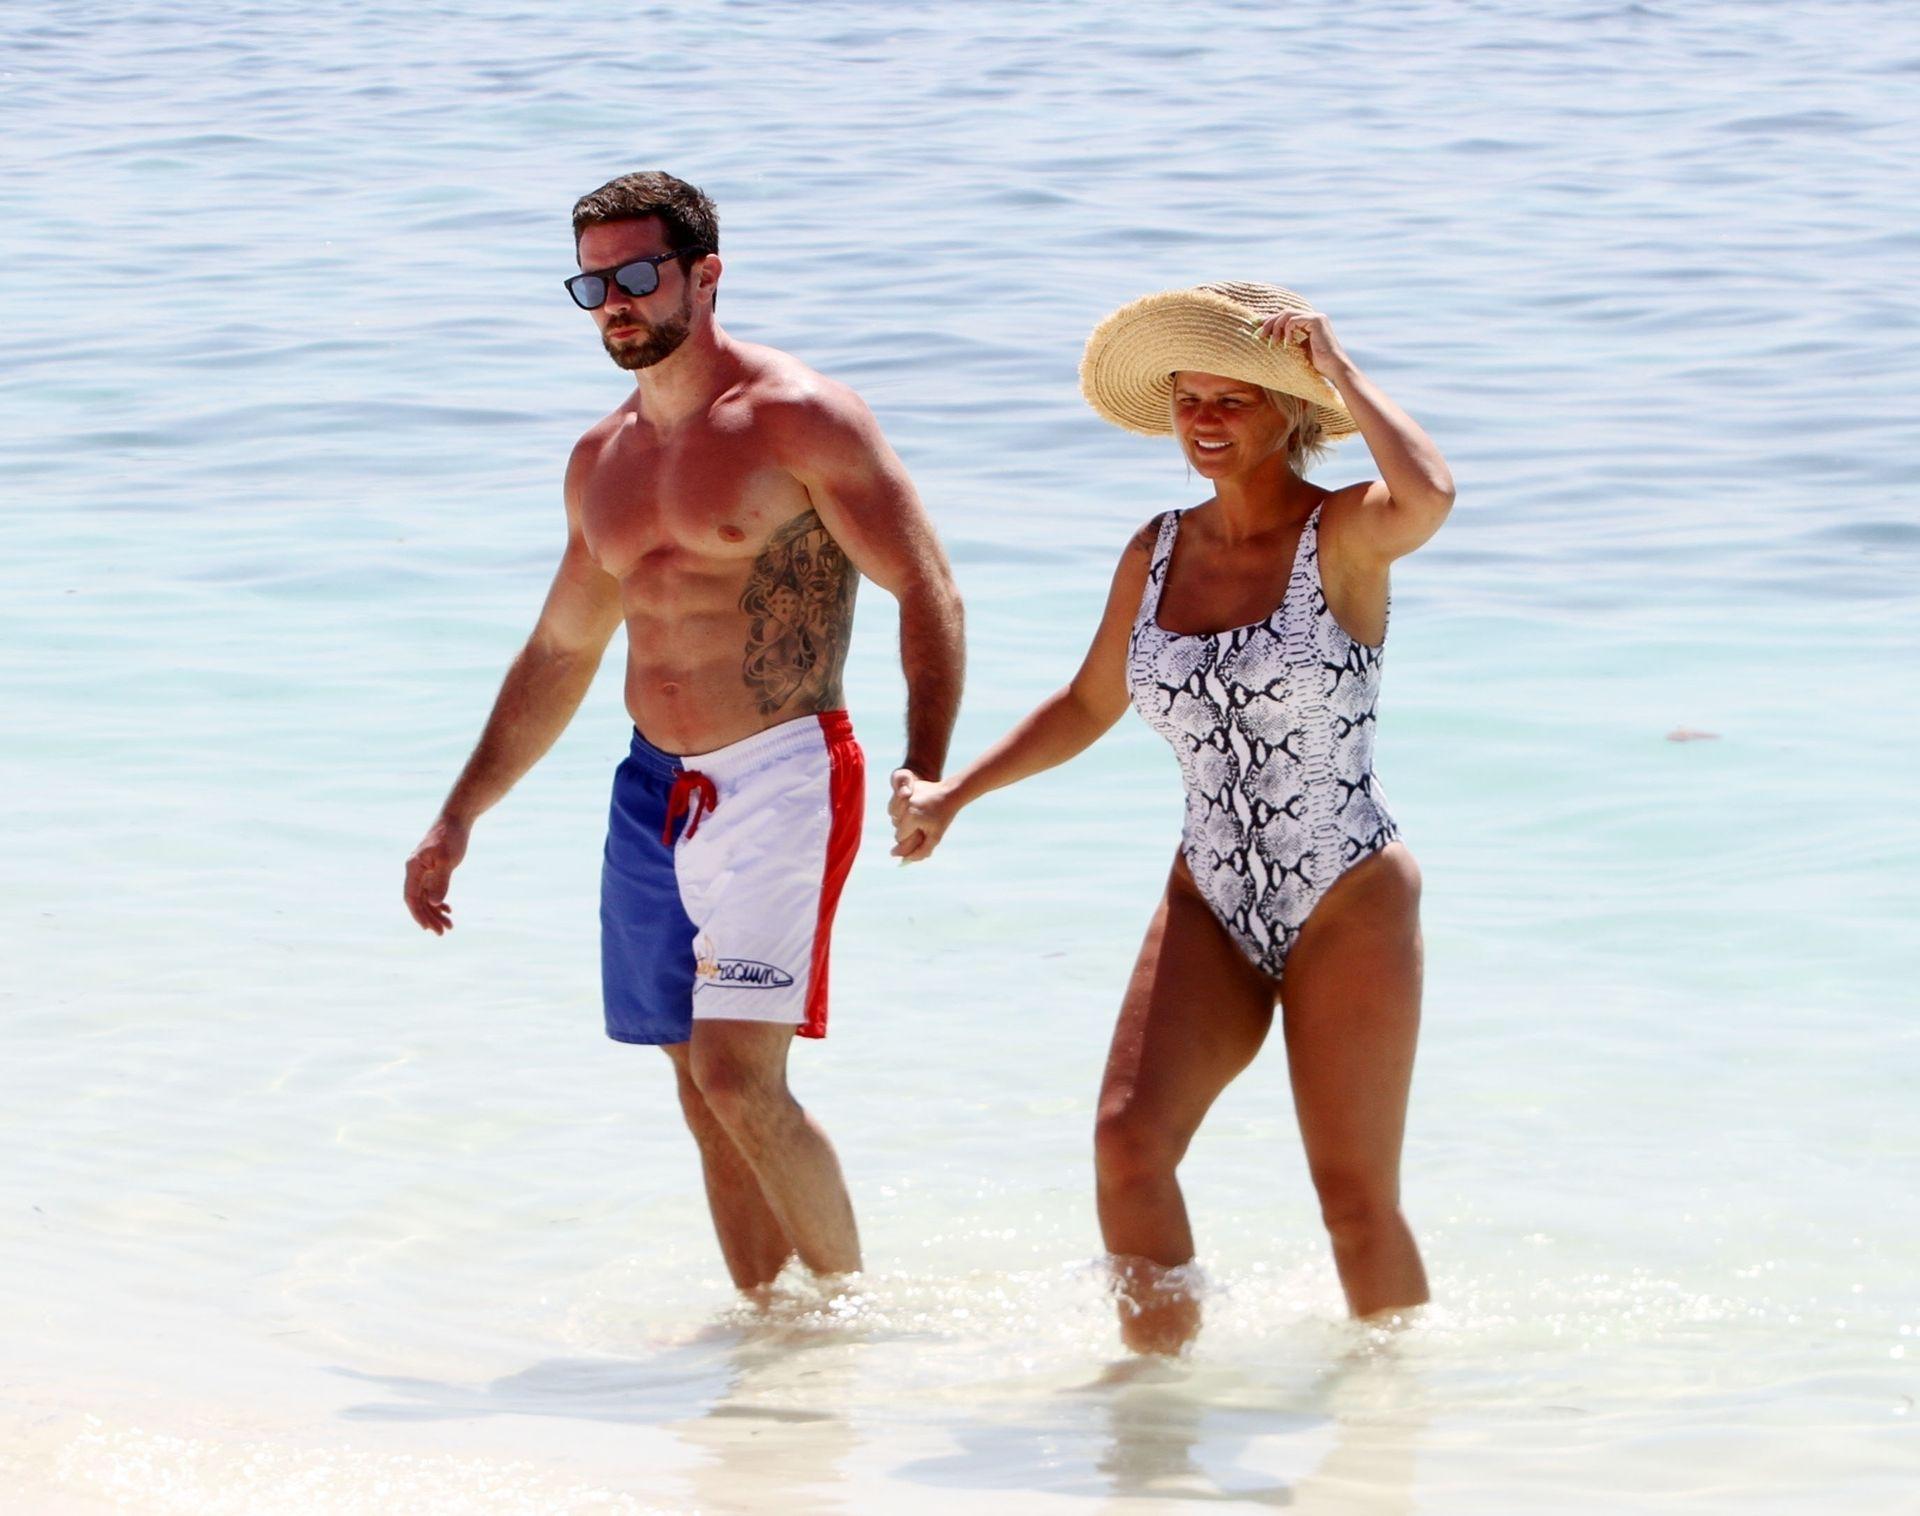 Kerry Katona & Ryan Mahoney Hit The Beach On Holiday At Their Luxury 5 Star Resort Ayada Maldives 0014